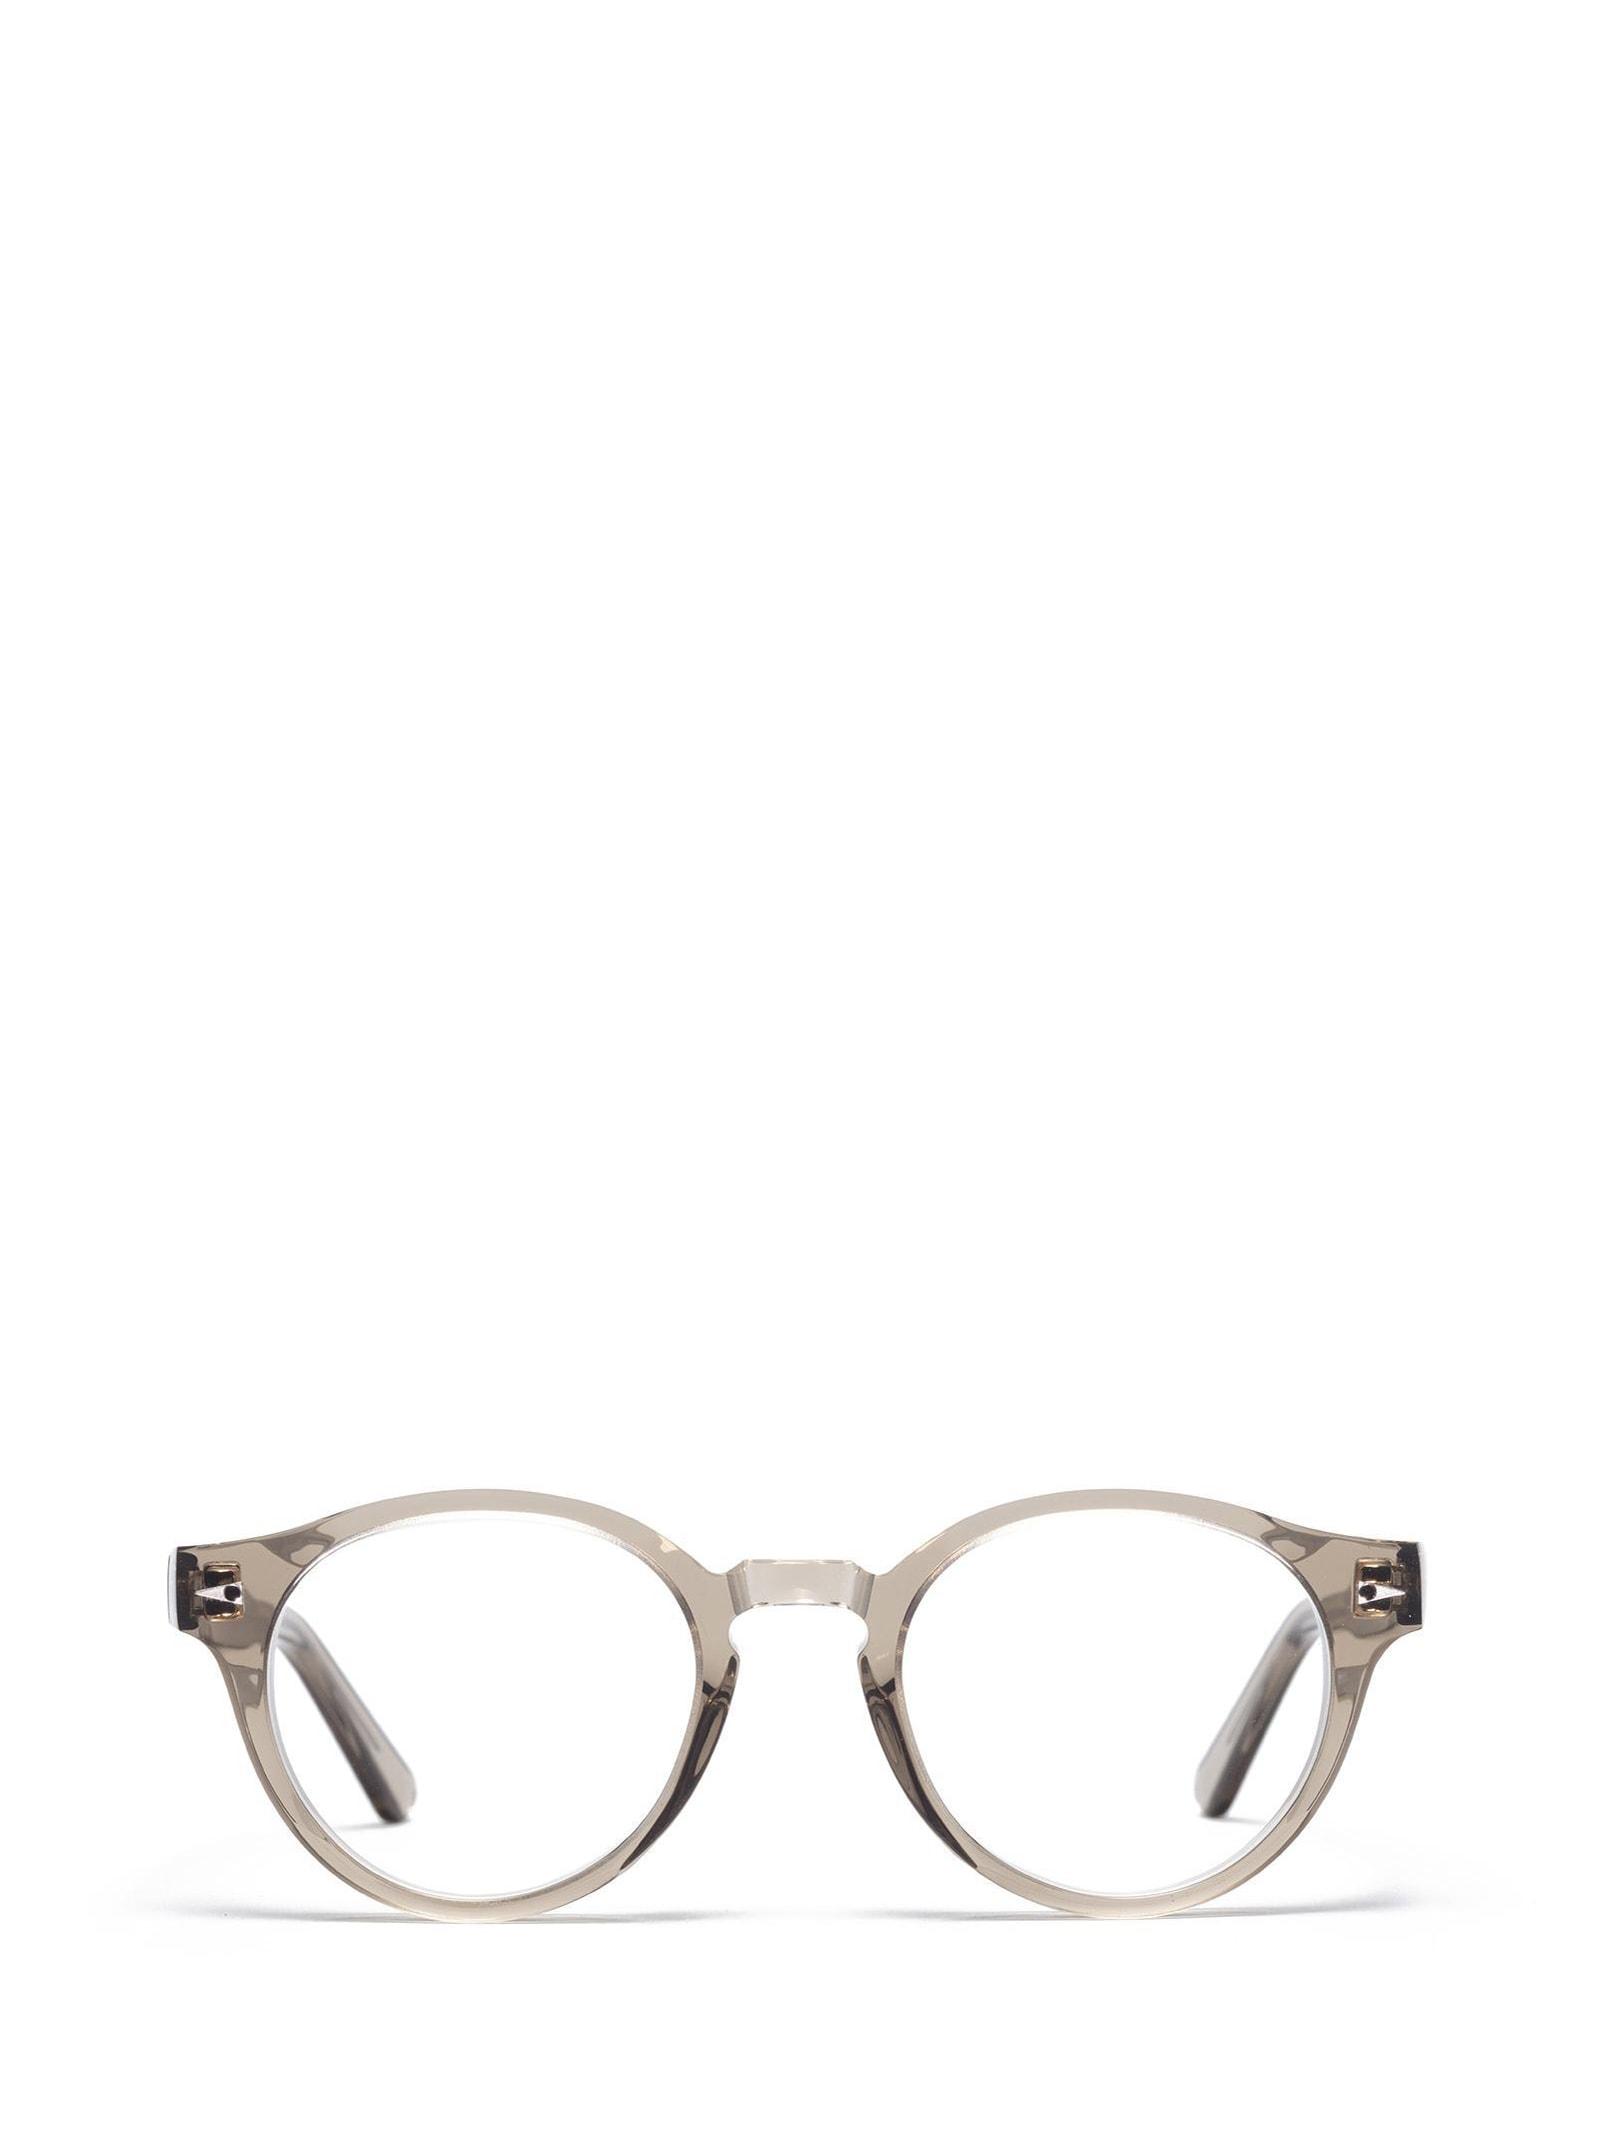 AHLEM Ahlem Rue Du Theatre Smokedlight Glasses